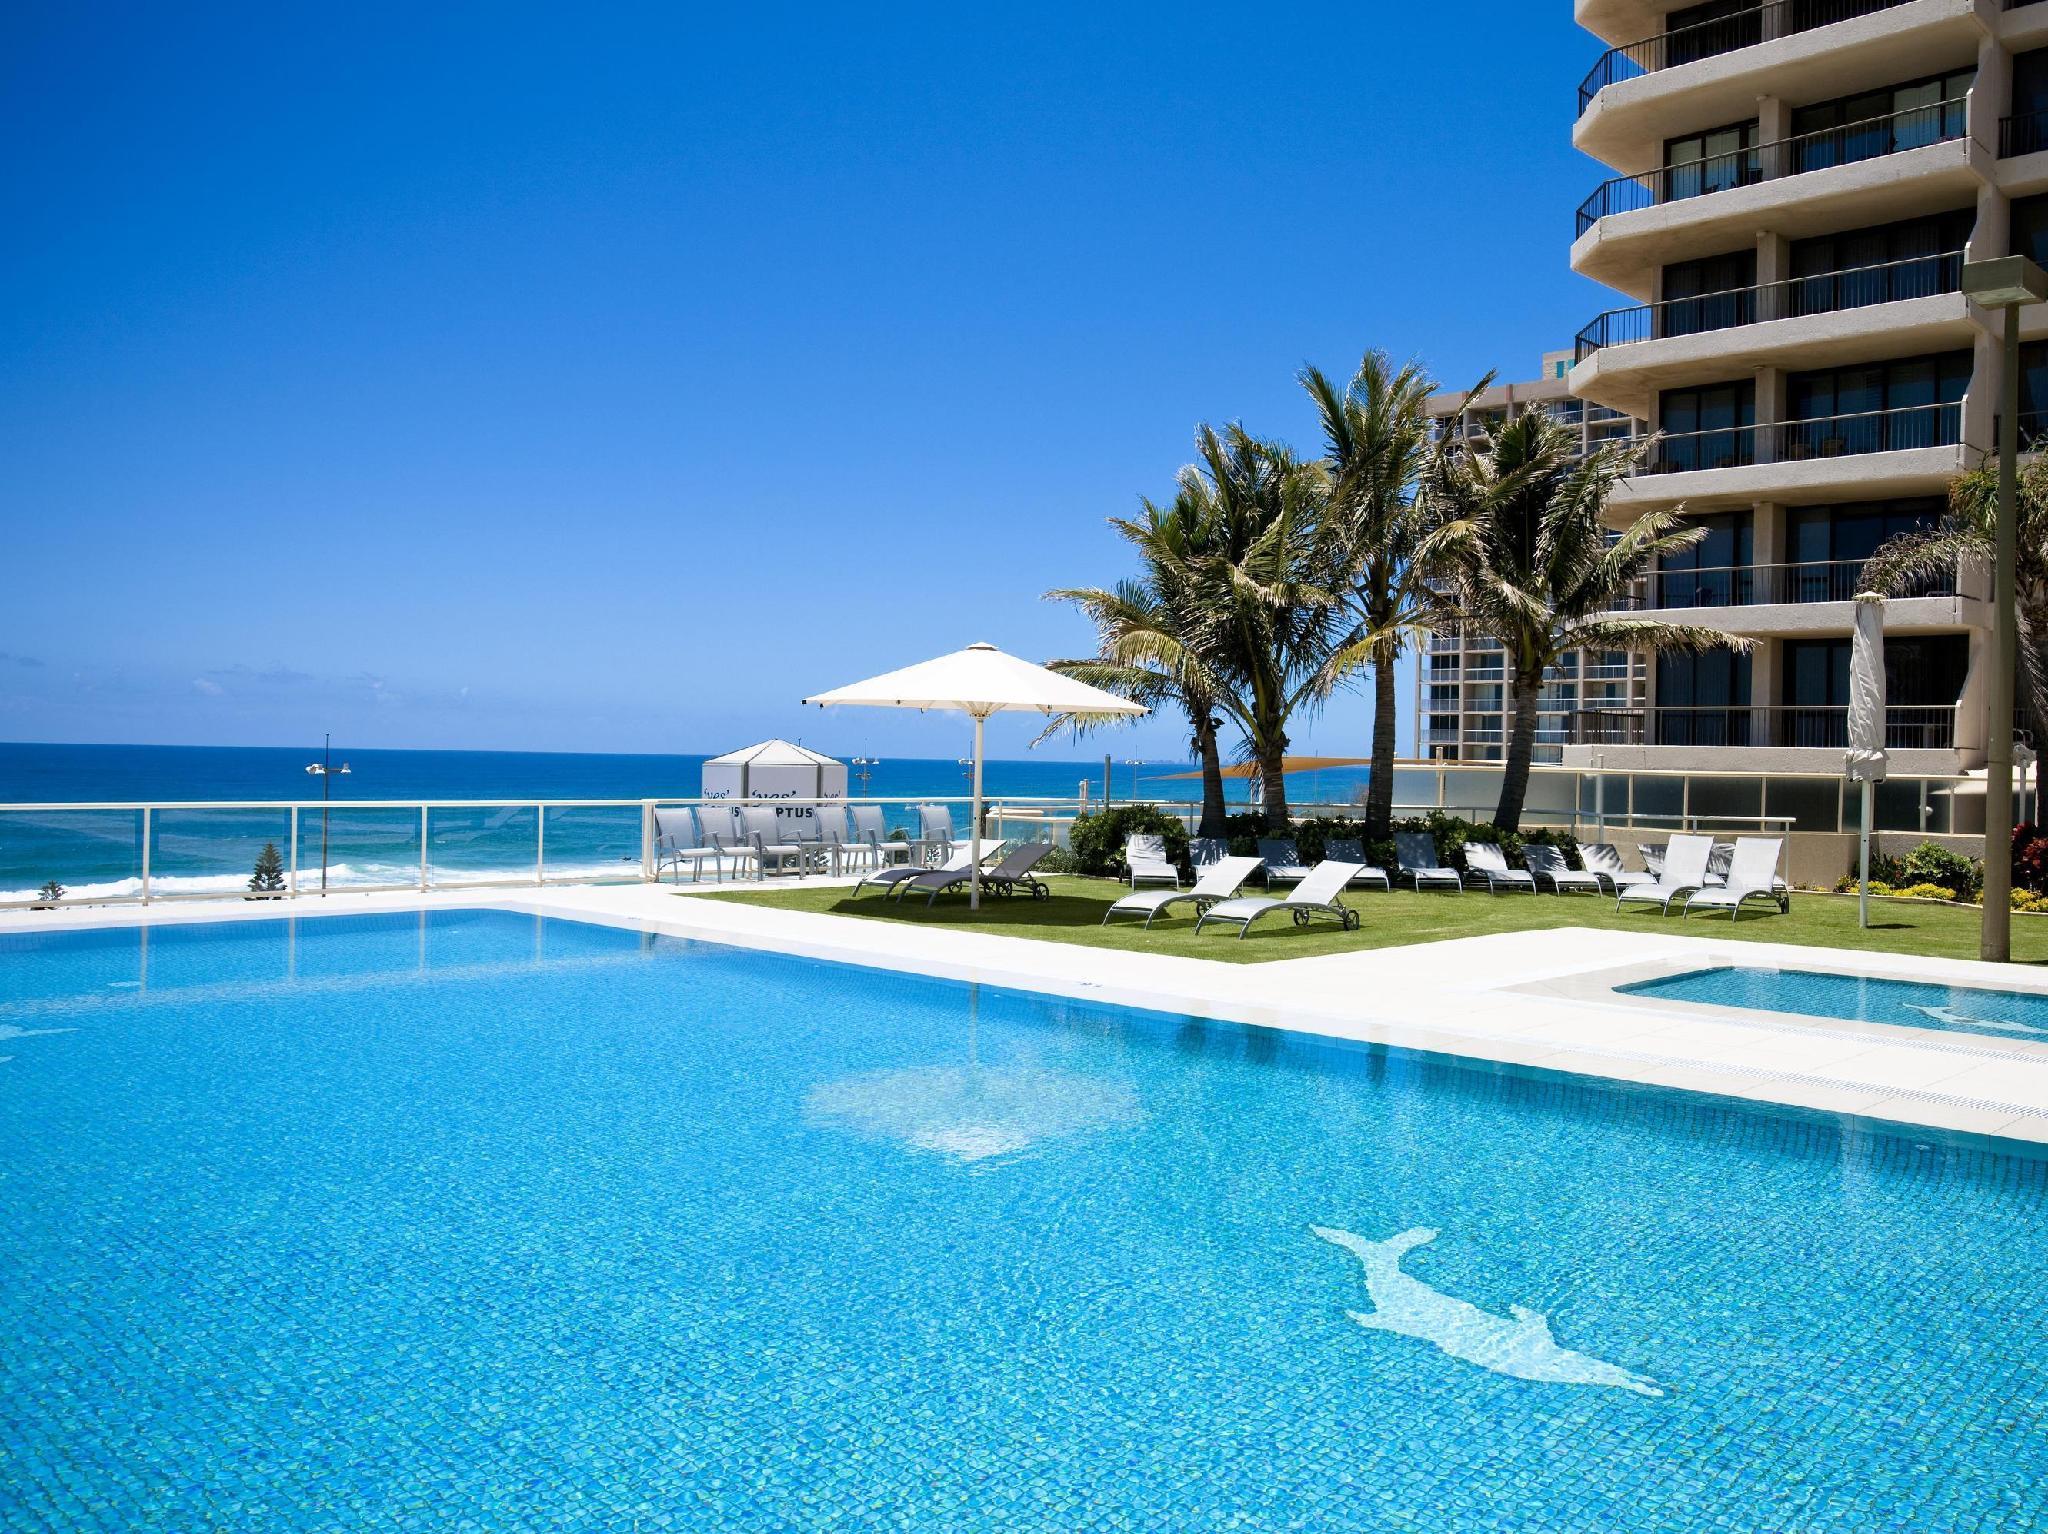 Paradise Centre Apartments - Hotell och Boende i Australien , Guldkusten